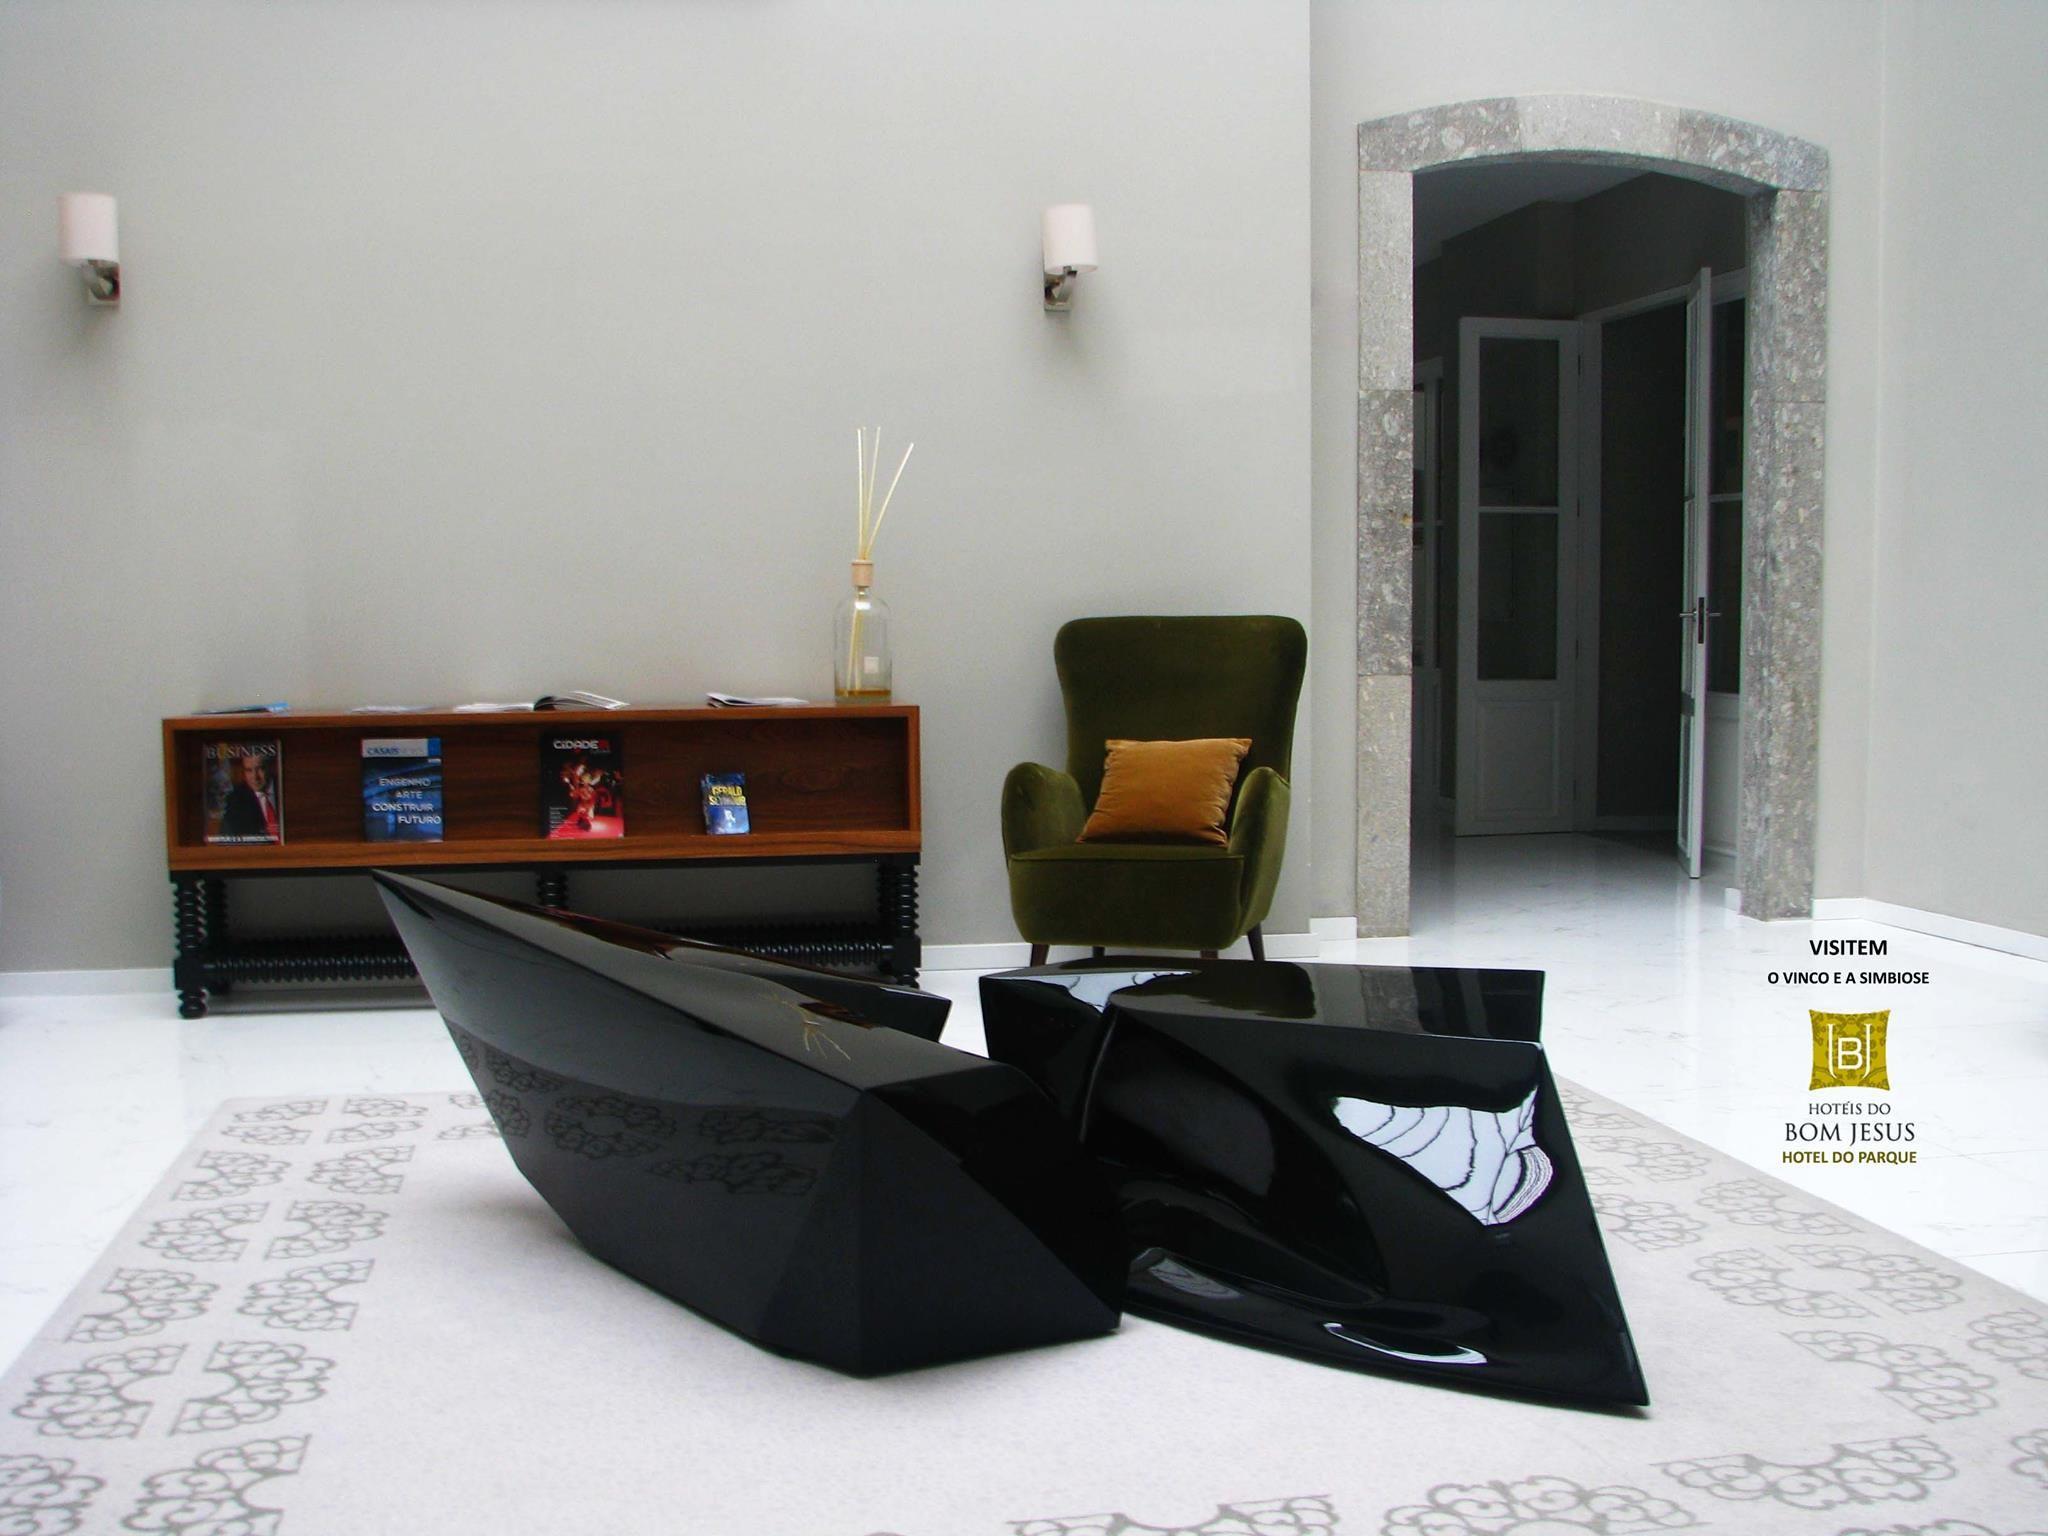 Vinco e a Simbiose at the Hotel do Bom Jesus - Braga - Portugal